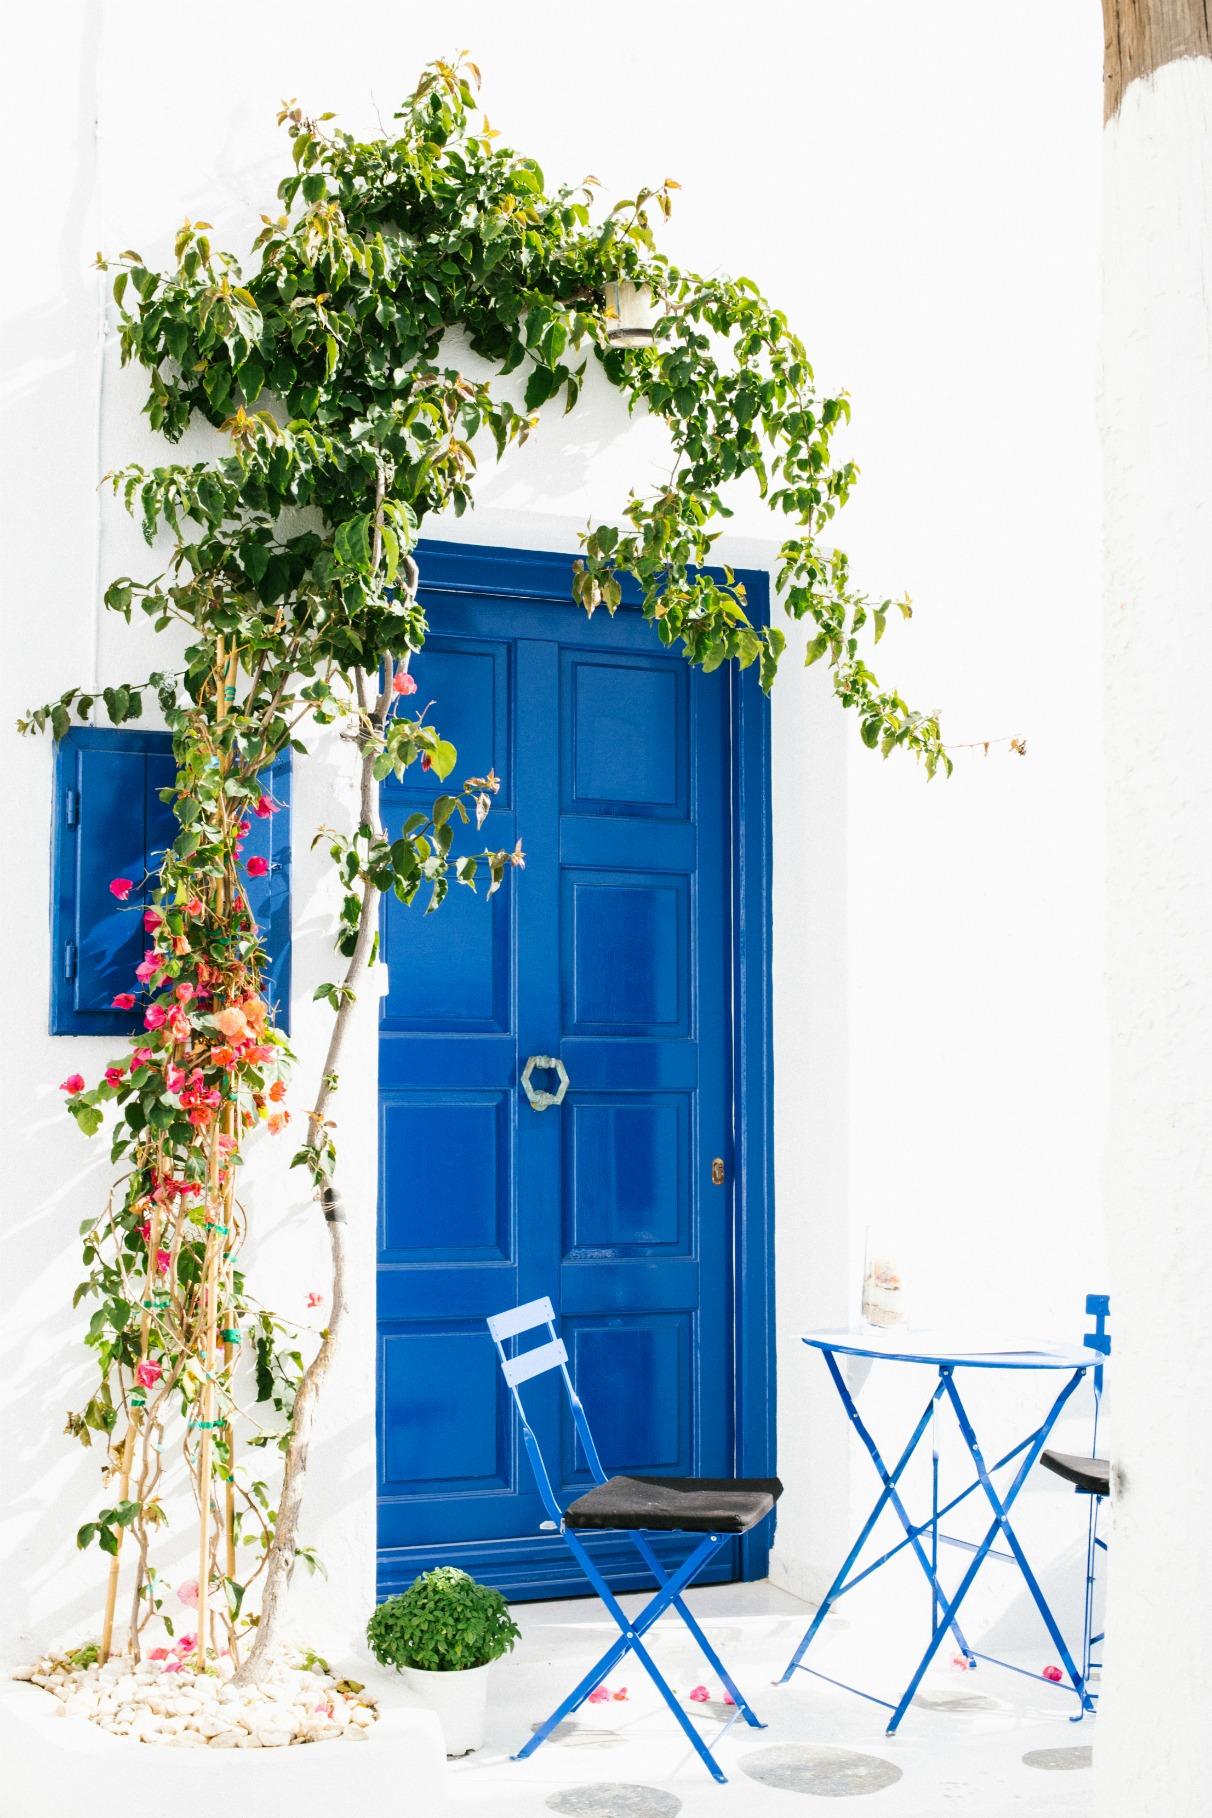 wind-mills-mykonos-town-2016-holidays-vacay-disi-couture-lemon-print-dress-43